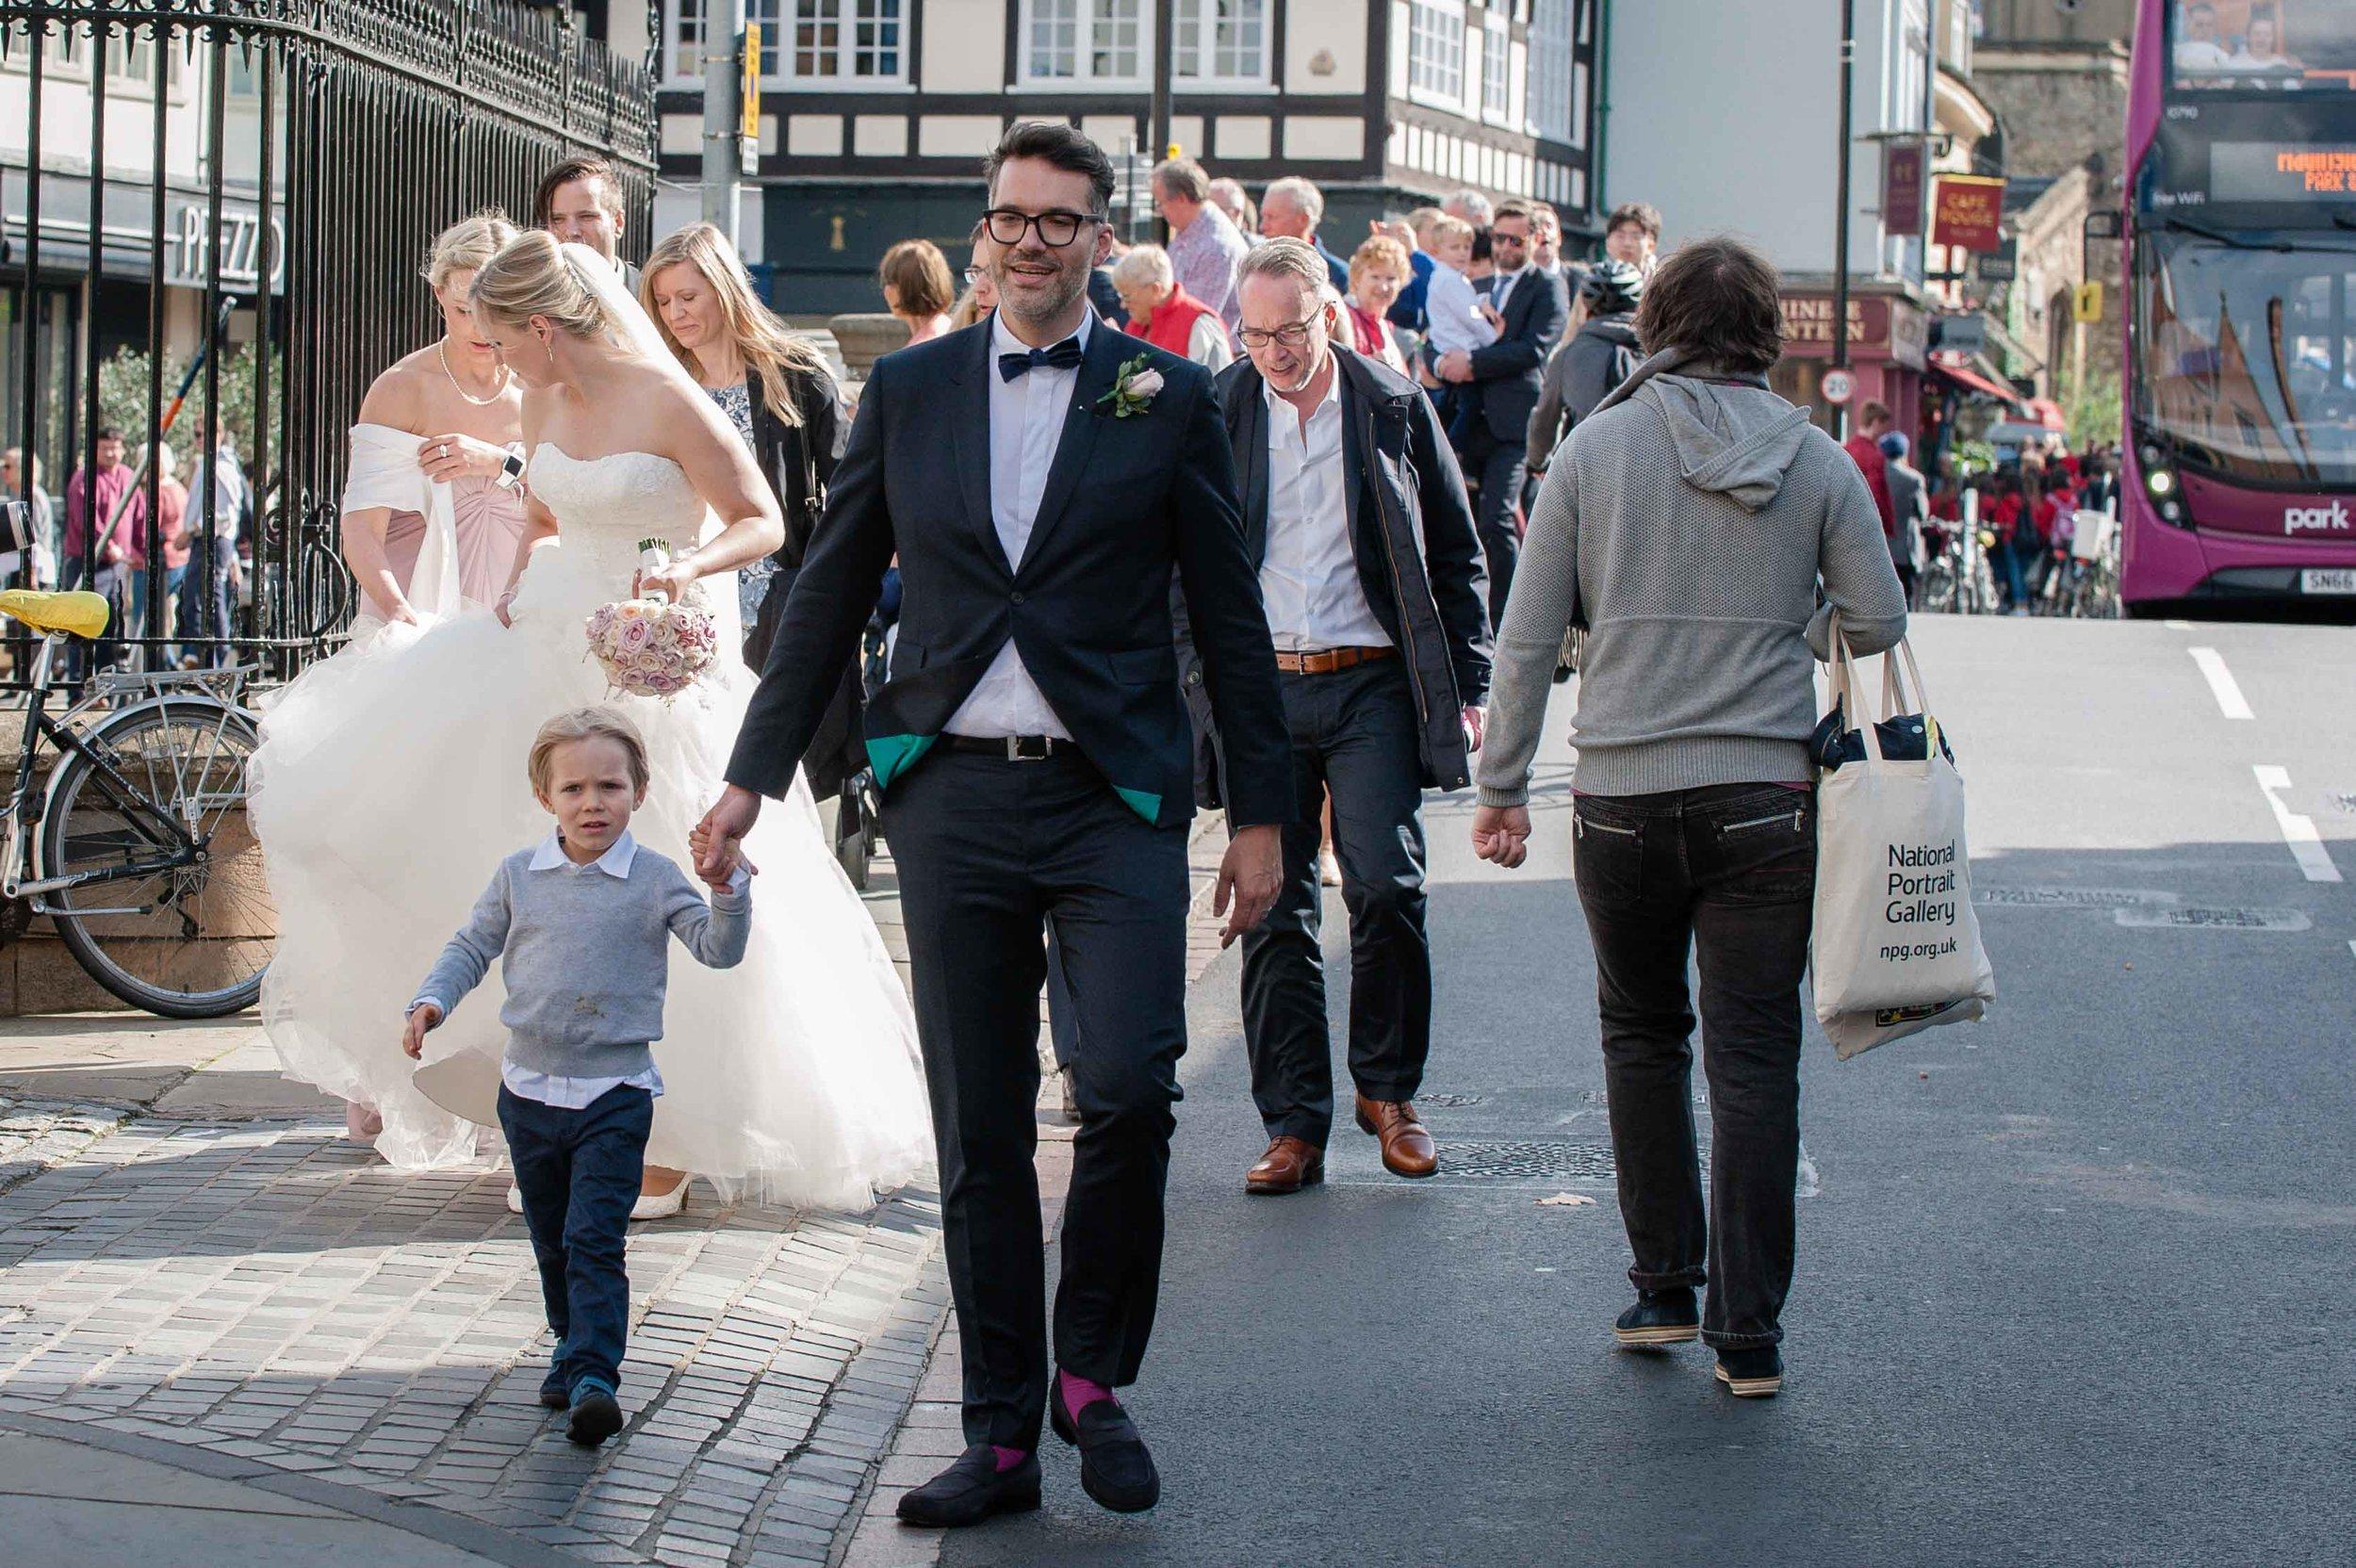 Adrian_Nicole_Charnwood_Weddings_Queens_College_Cambridge-1050.jpg